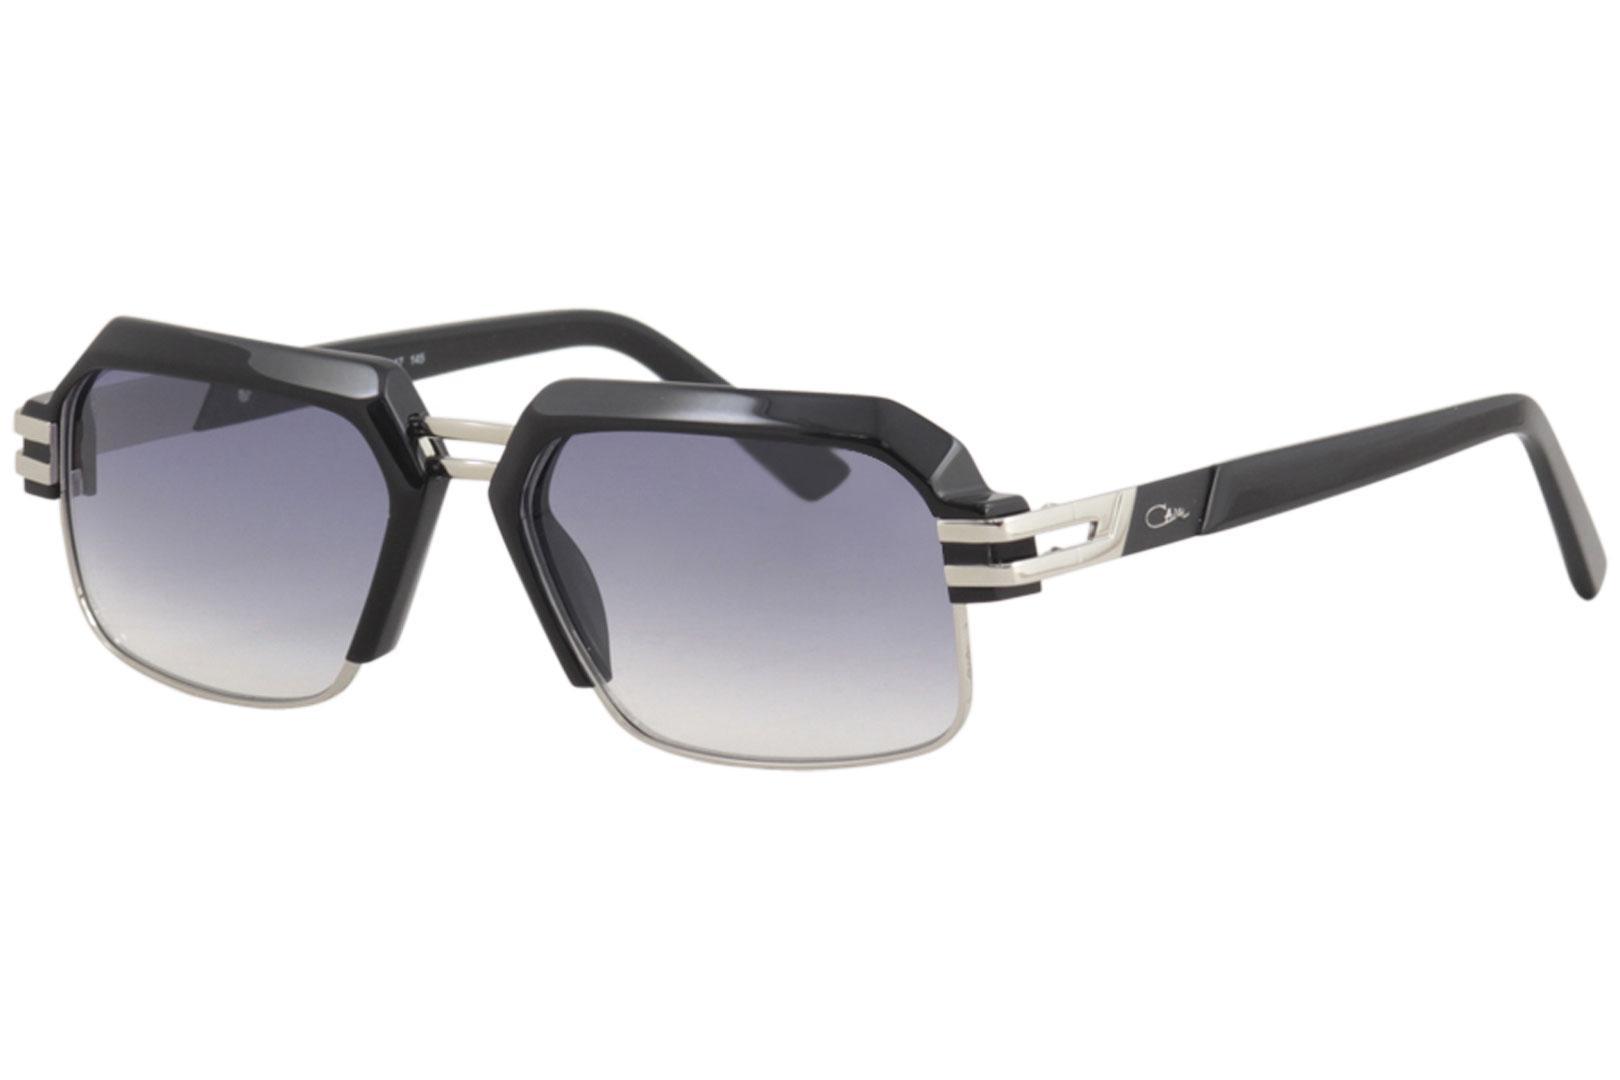 8451ff7eae4b Cazal Men s 6020 Retro Rectangle Sunglasses